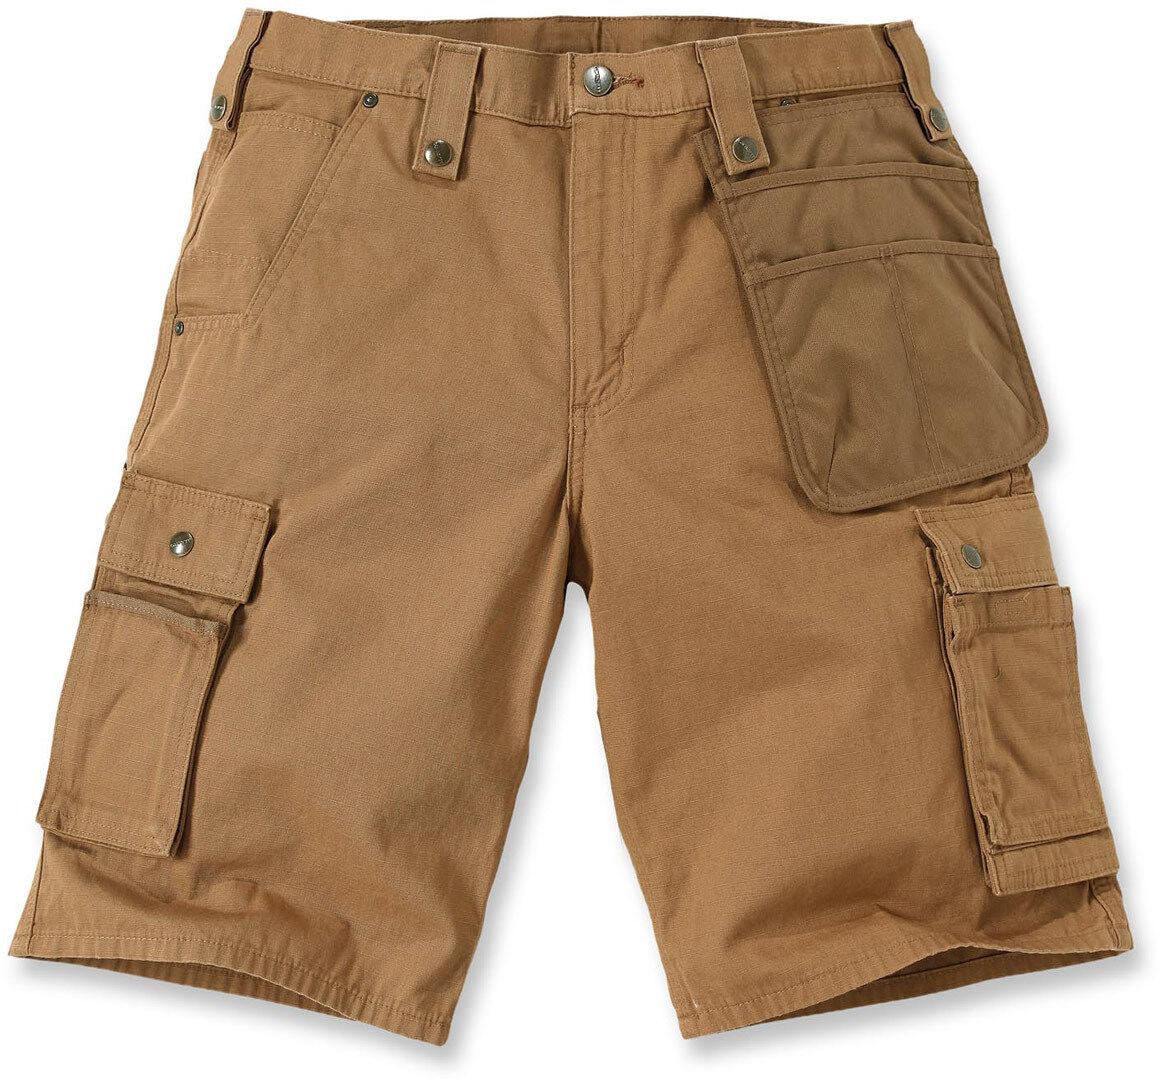 Carhartt Multi Pocket Ripstop Pantalones cortos Marrón 34